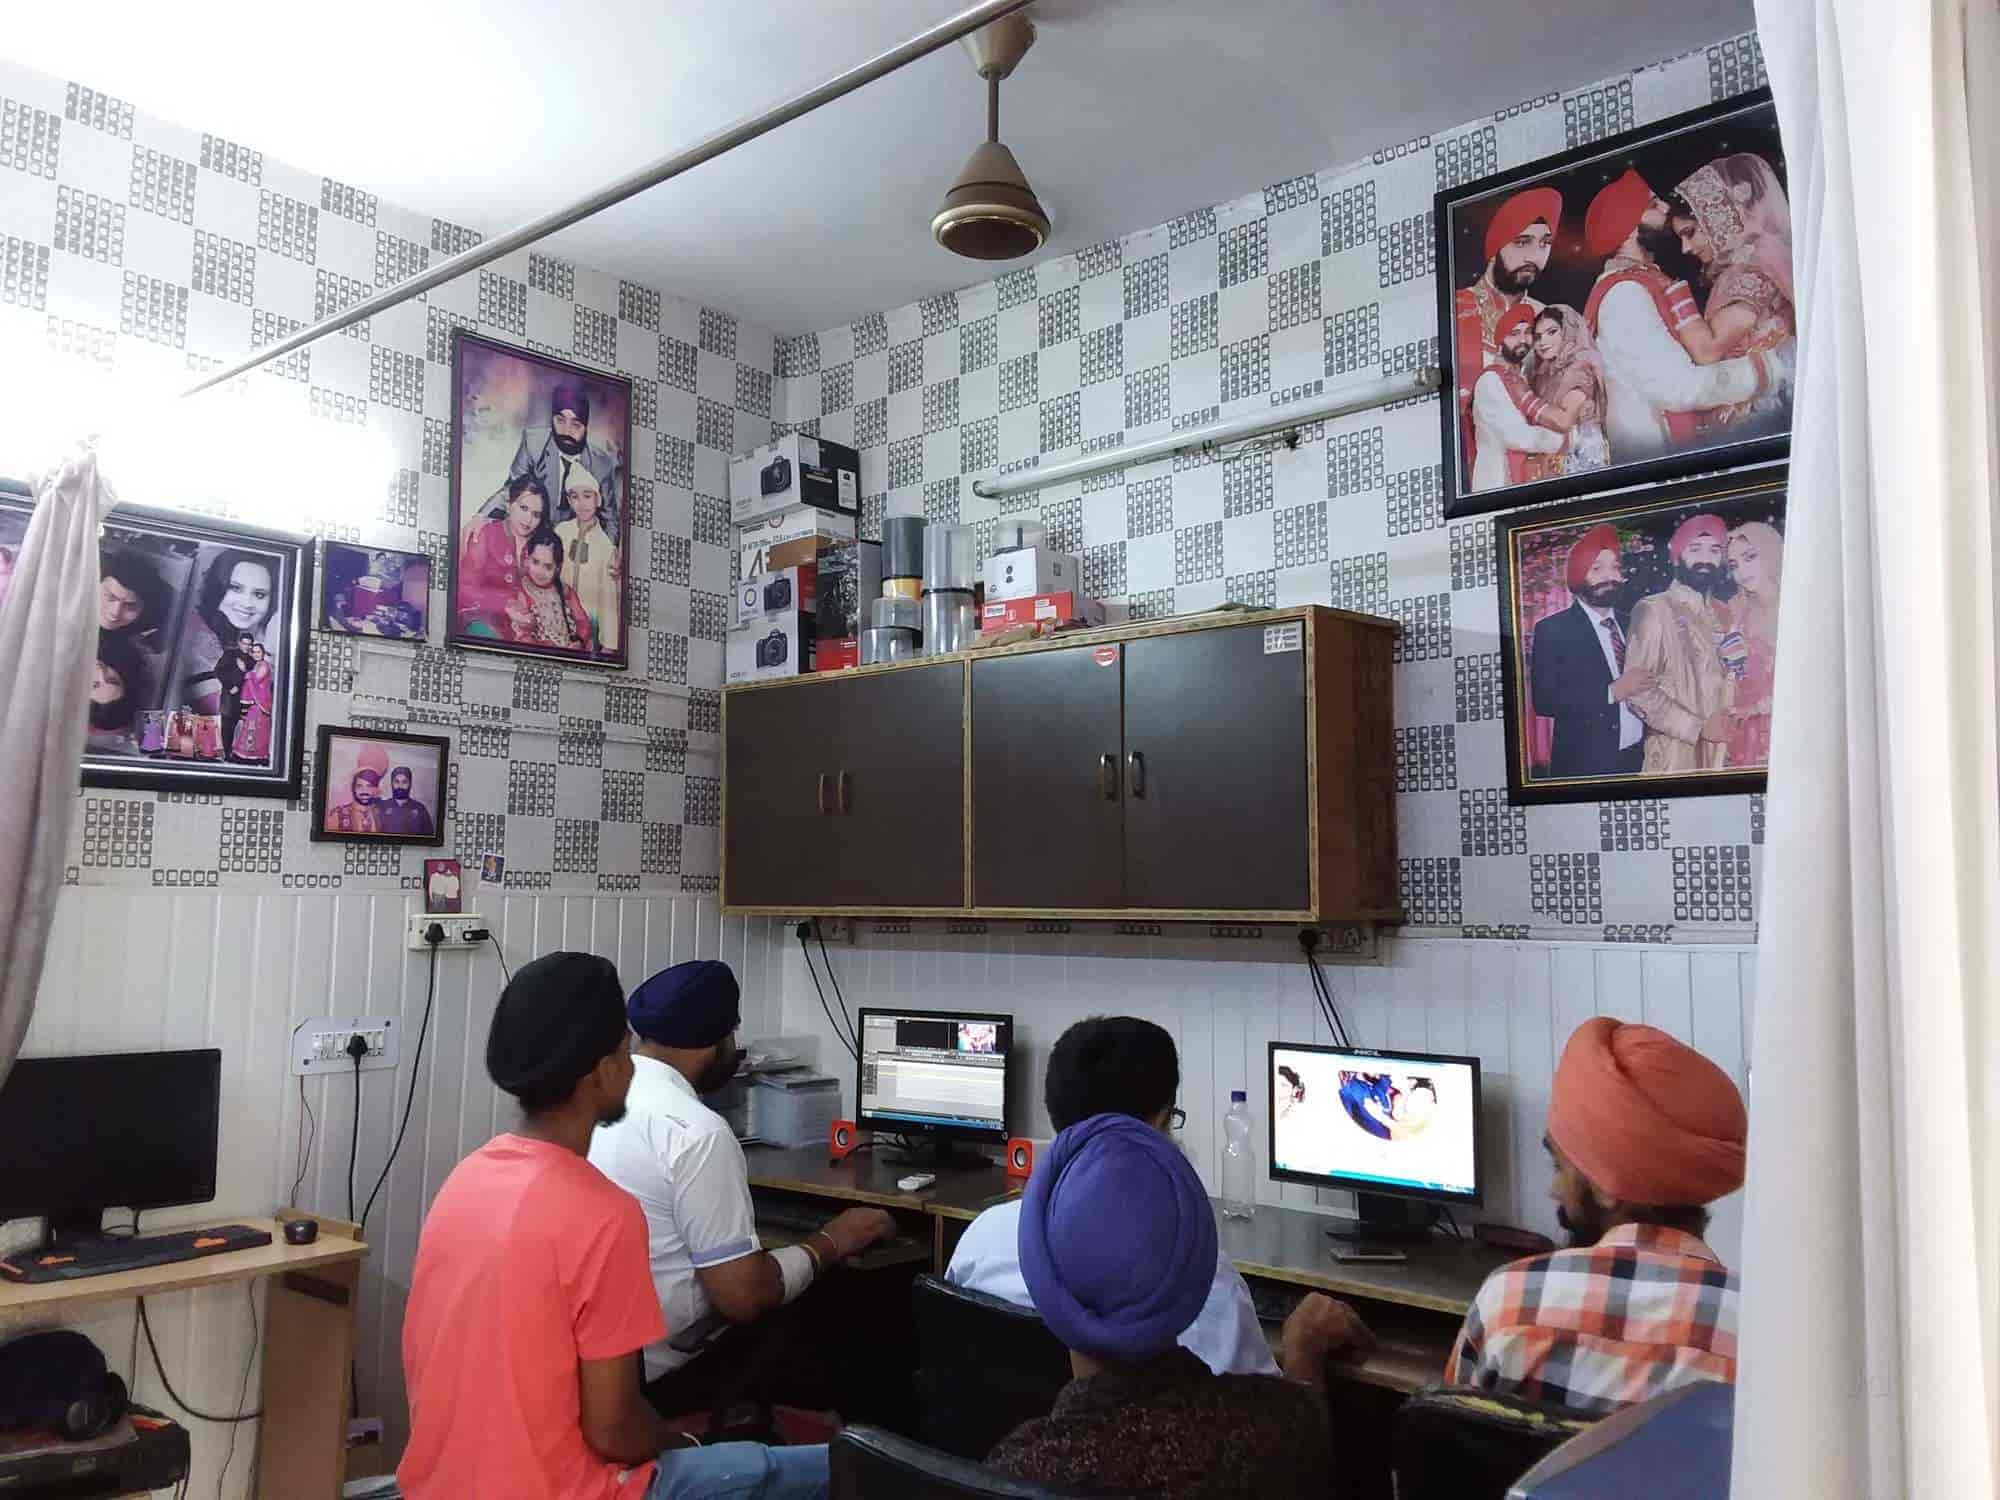 Target Digital Video Studio Photos, Vishnu Garden, Delhi- Pictures